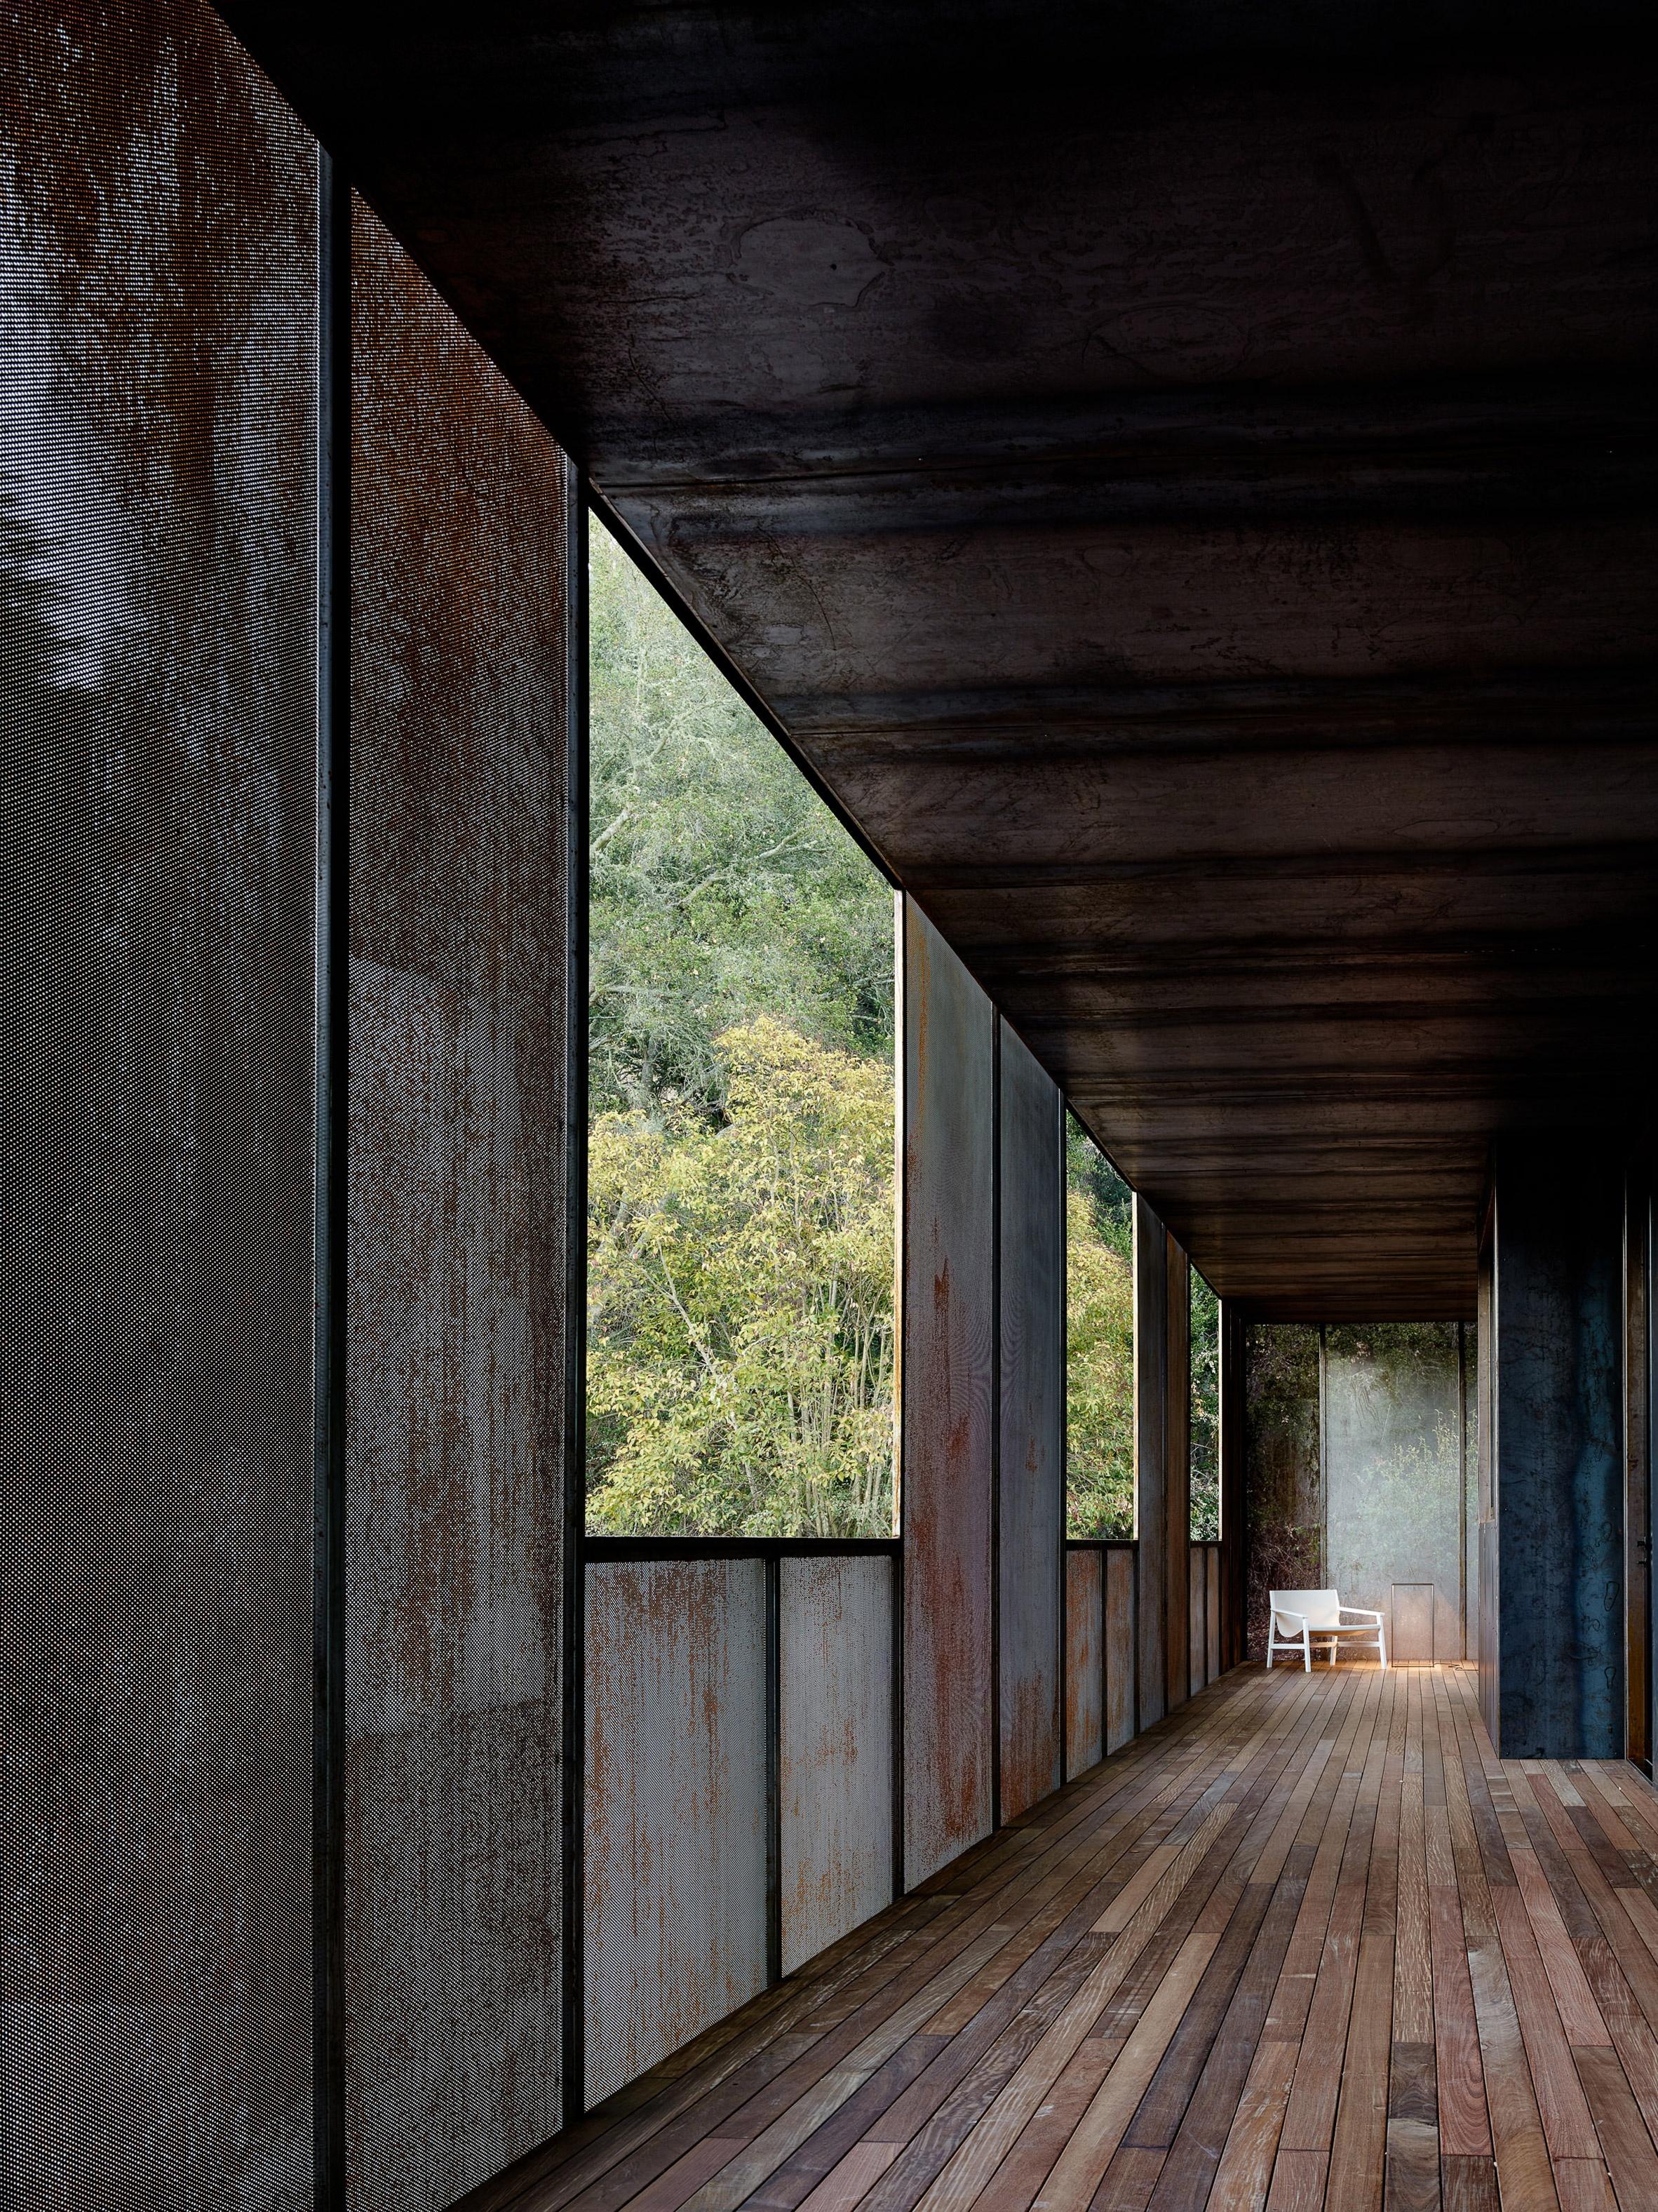 miner-road-faulkner-architects_dezeen_2364_col_44